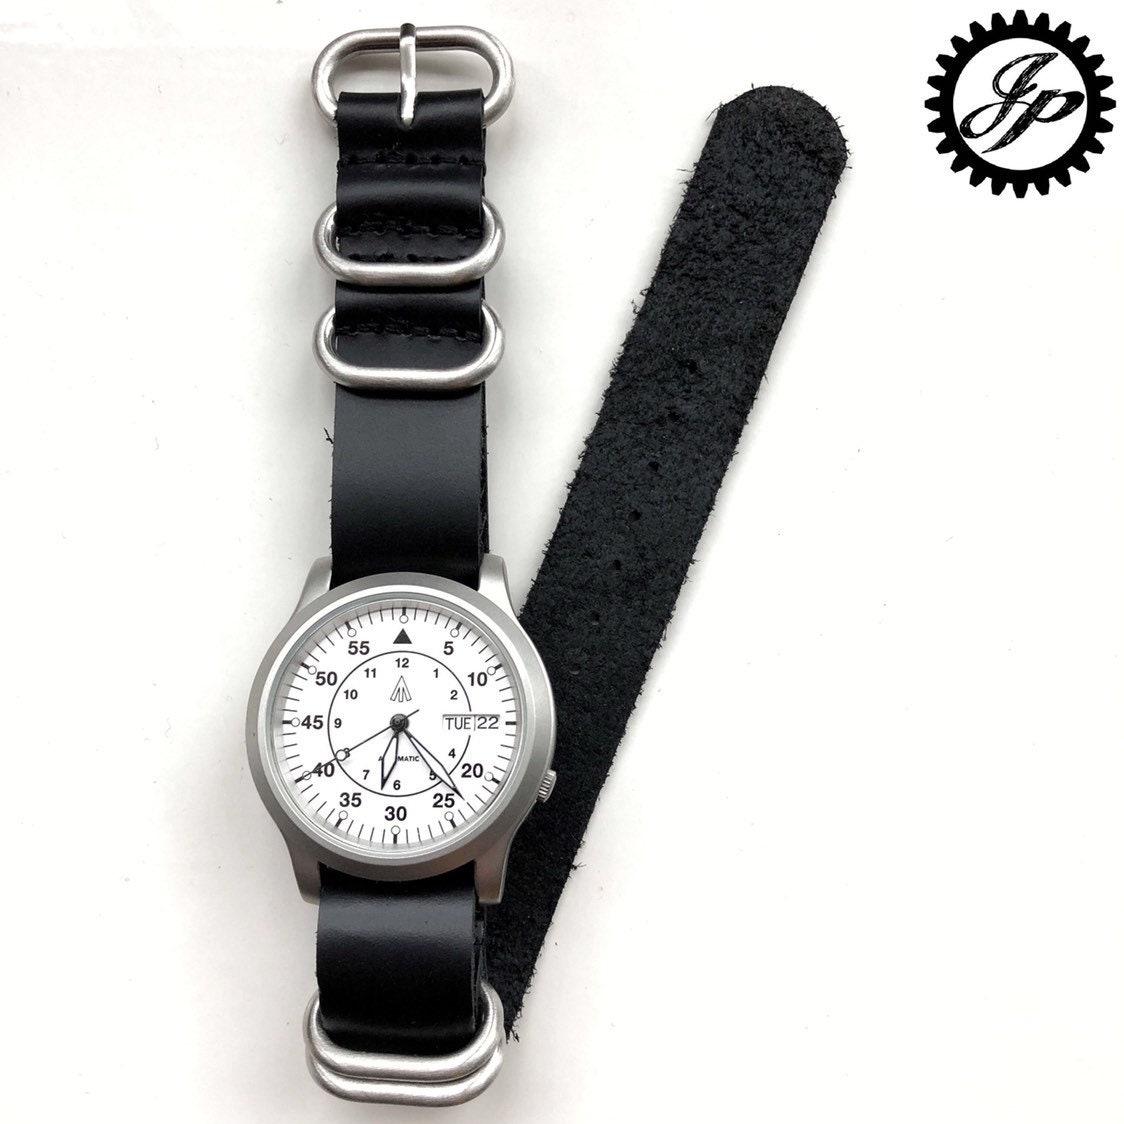 4fbc2f9c1 JPC106 Custom Automatic Pilot Watch Seiko 7s26 Mod | Etsy